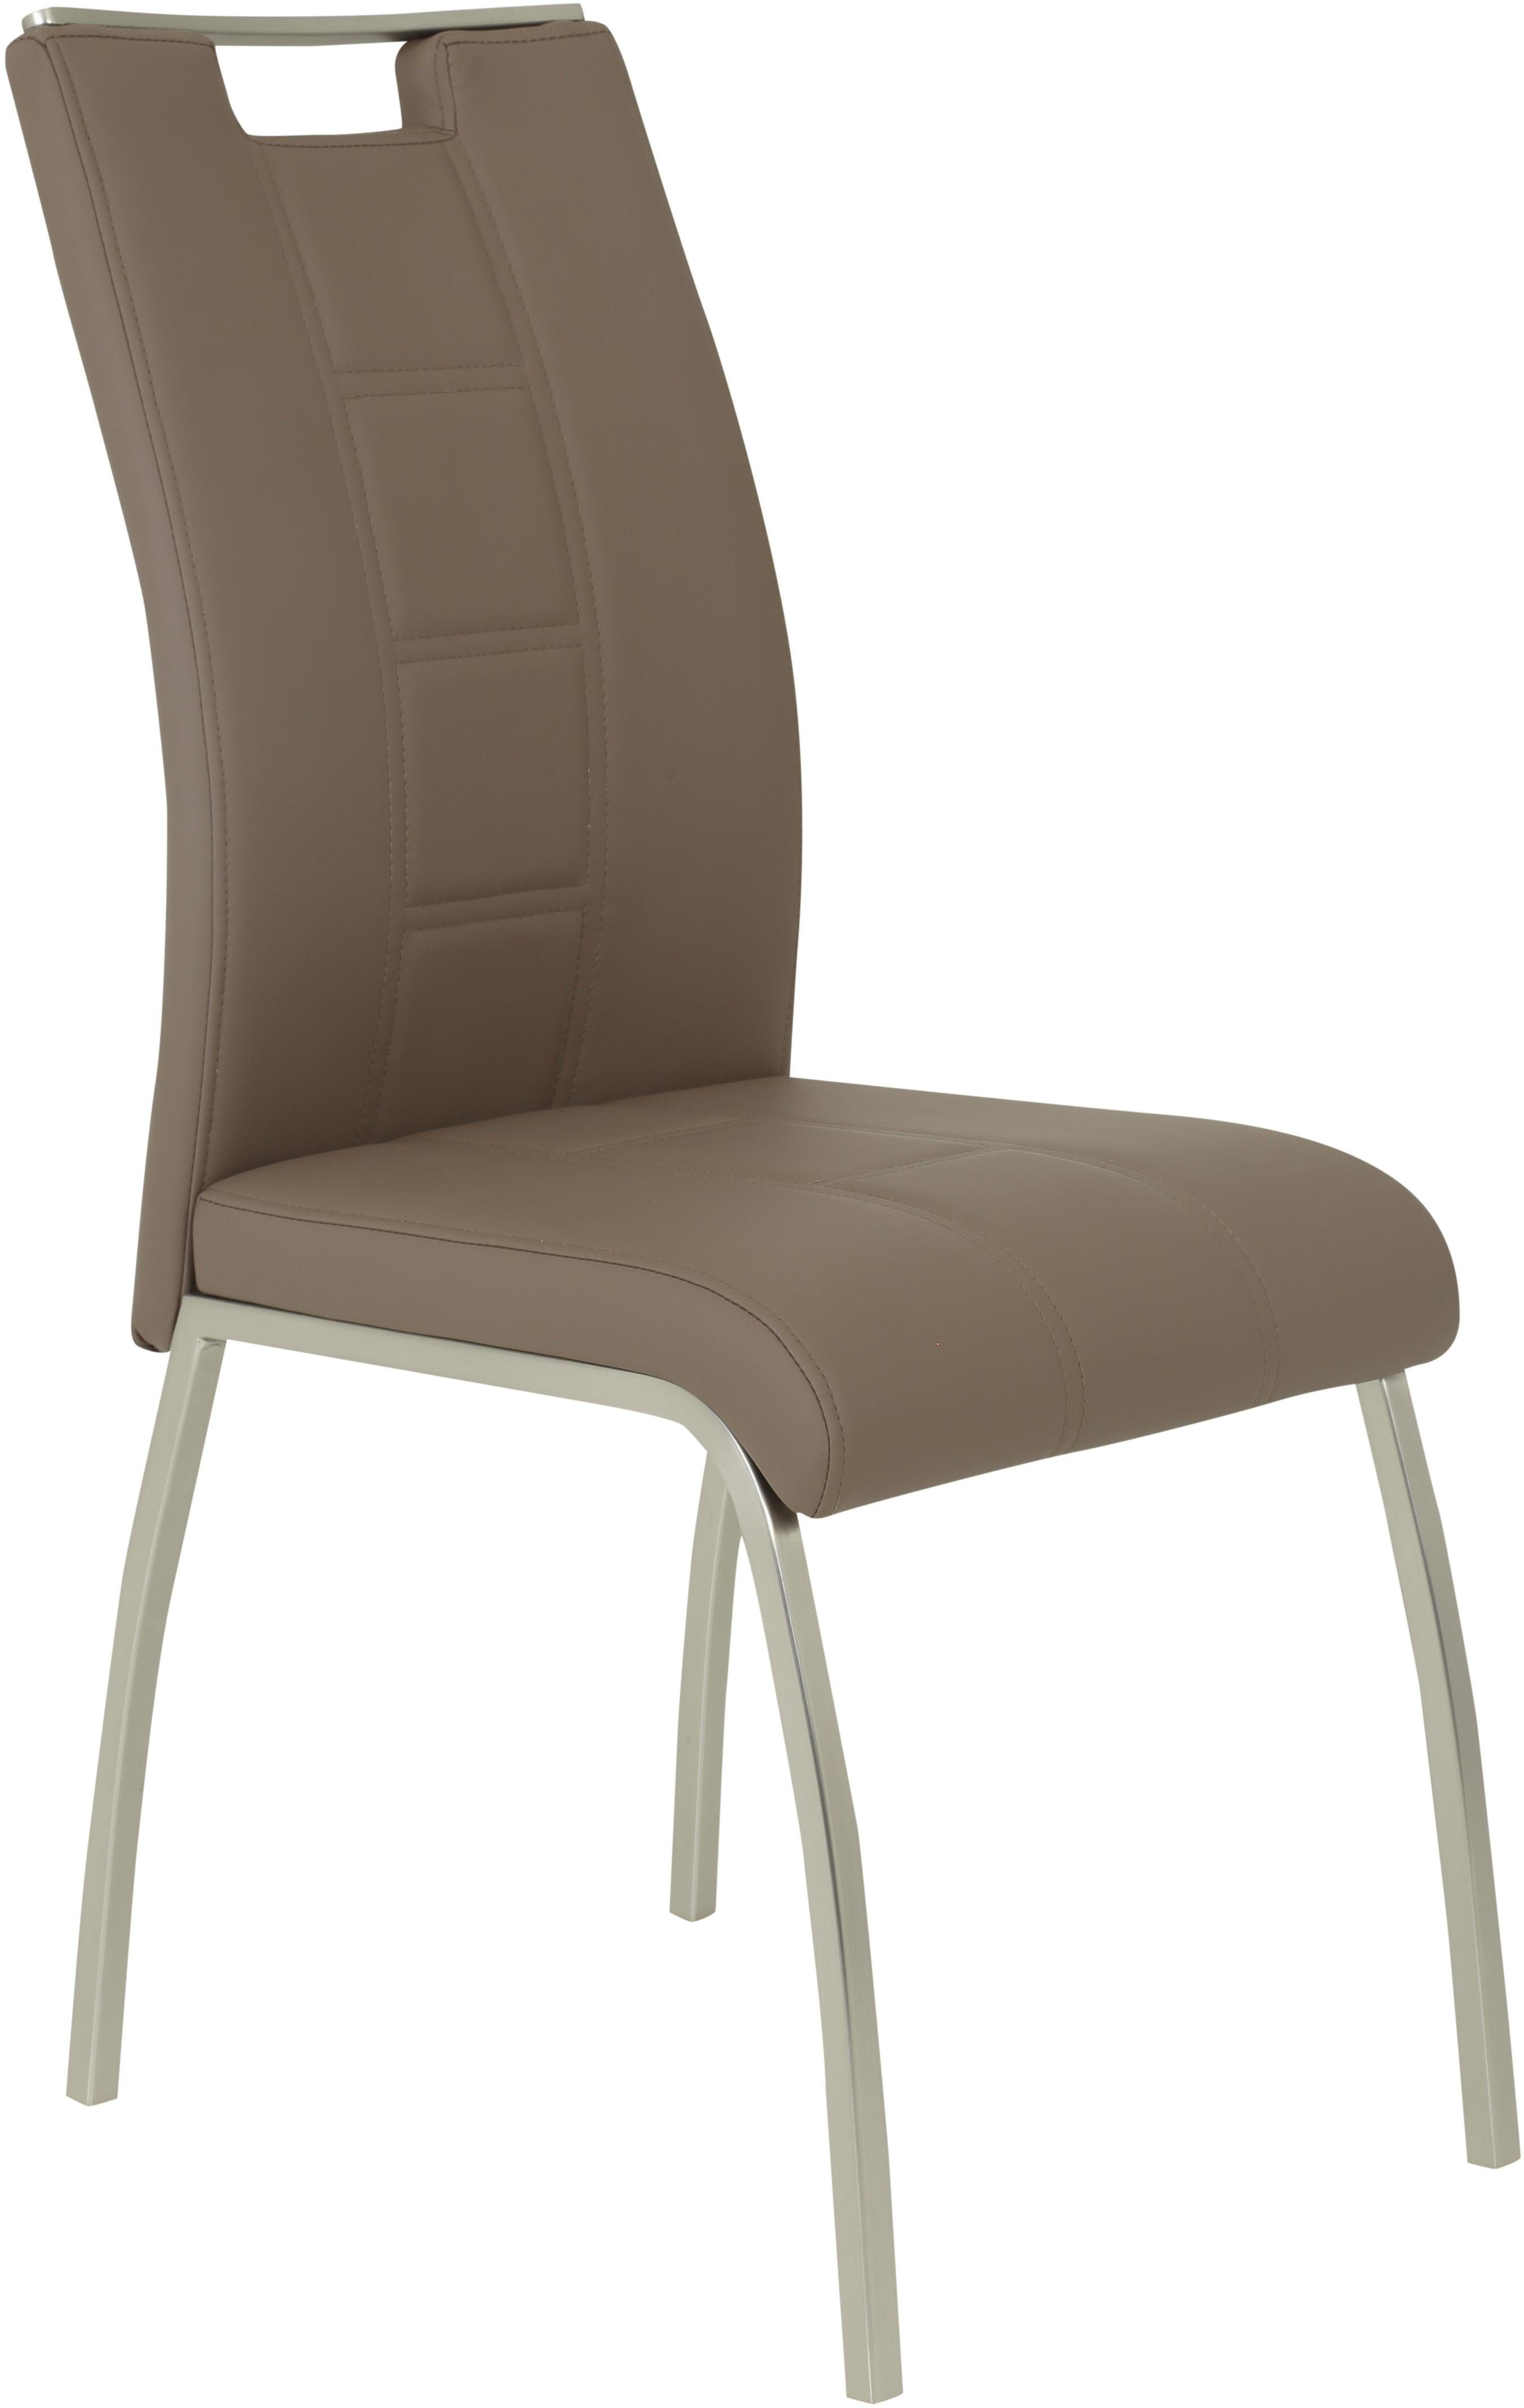 INOSIGN Stühle (2 Stück)